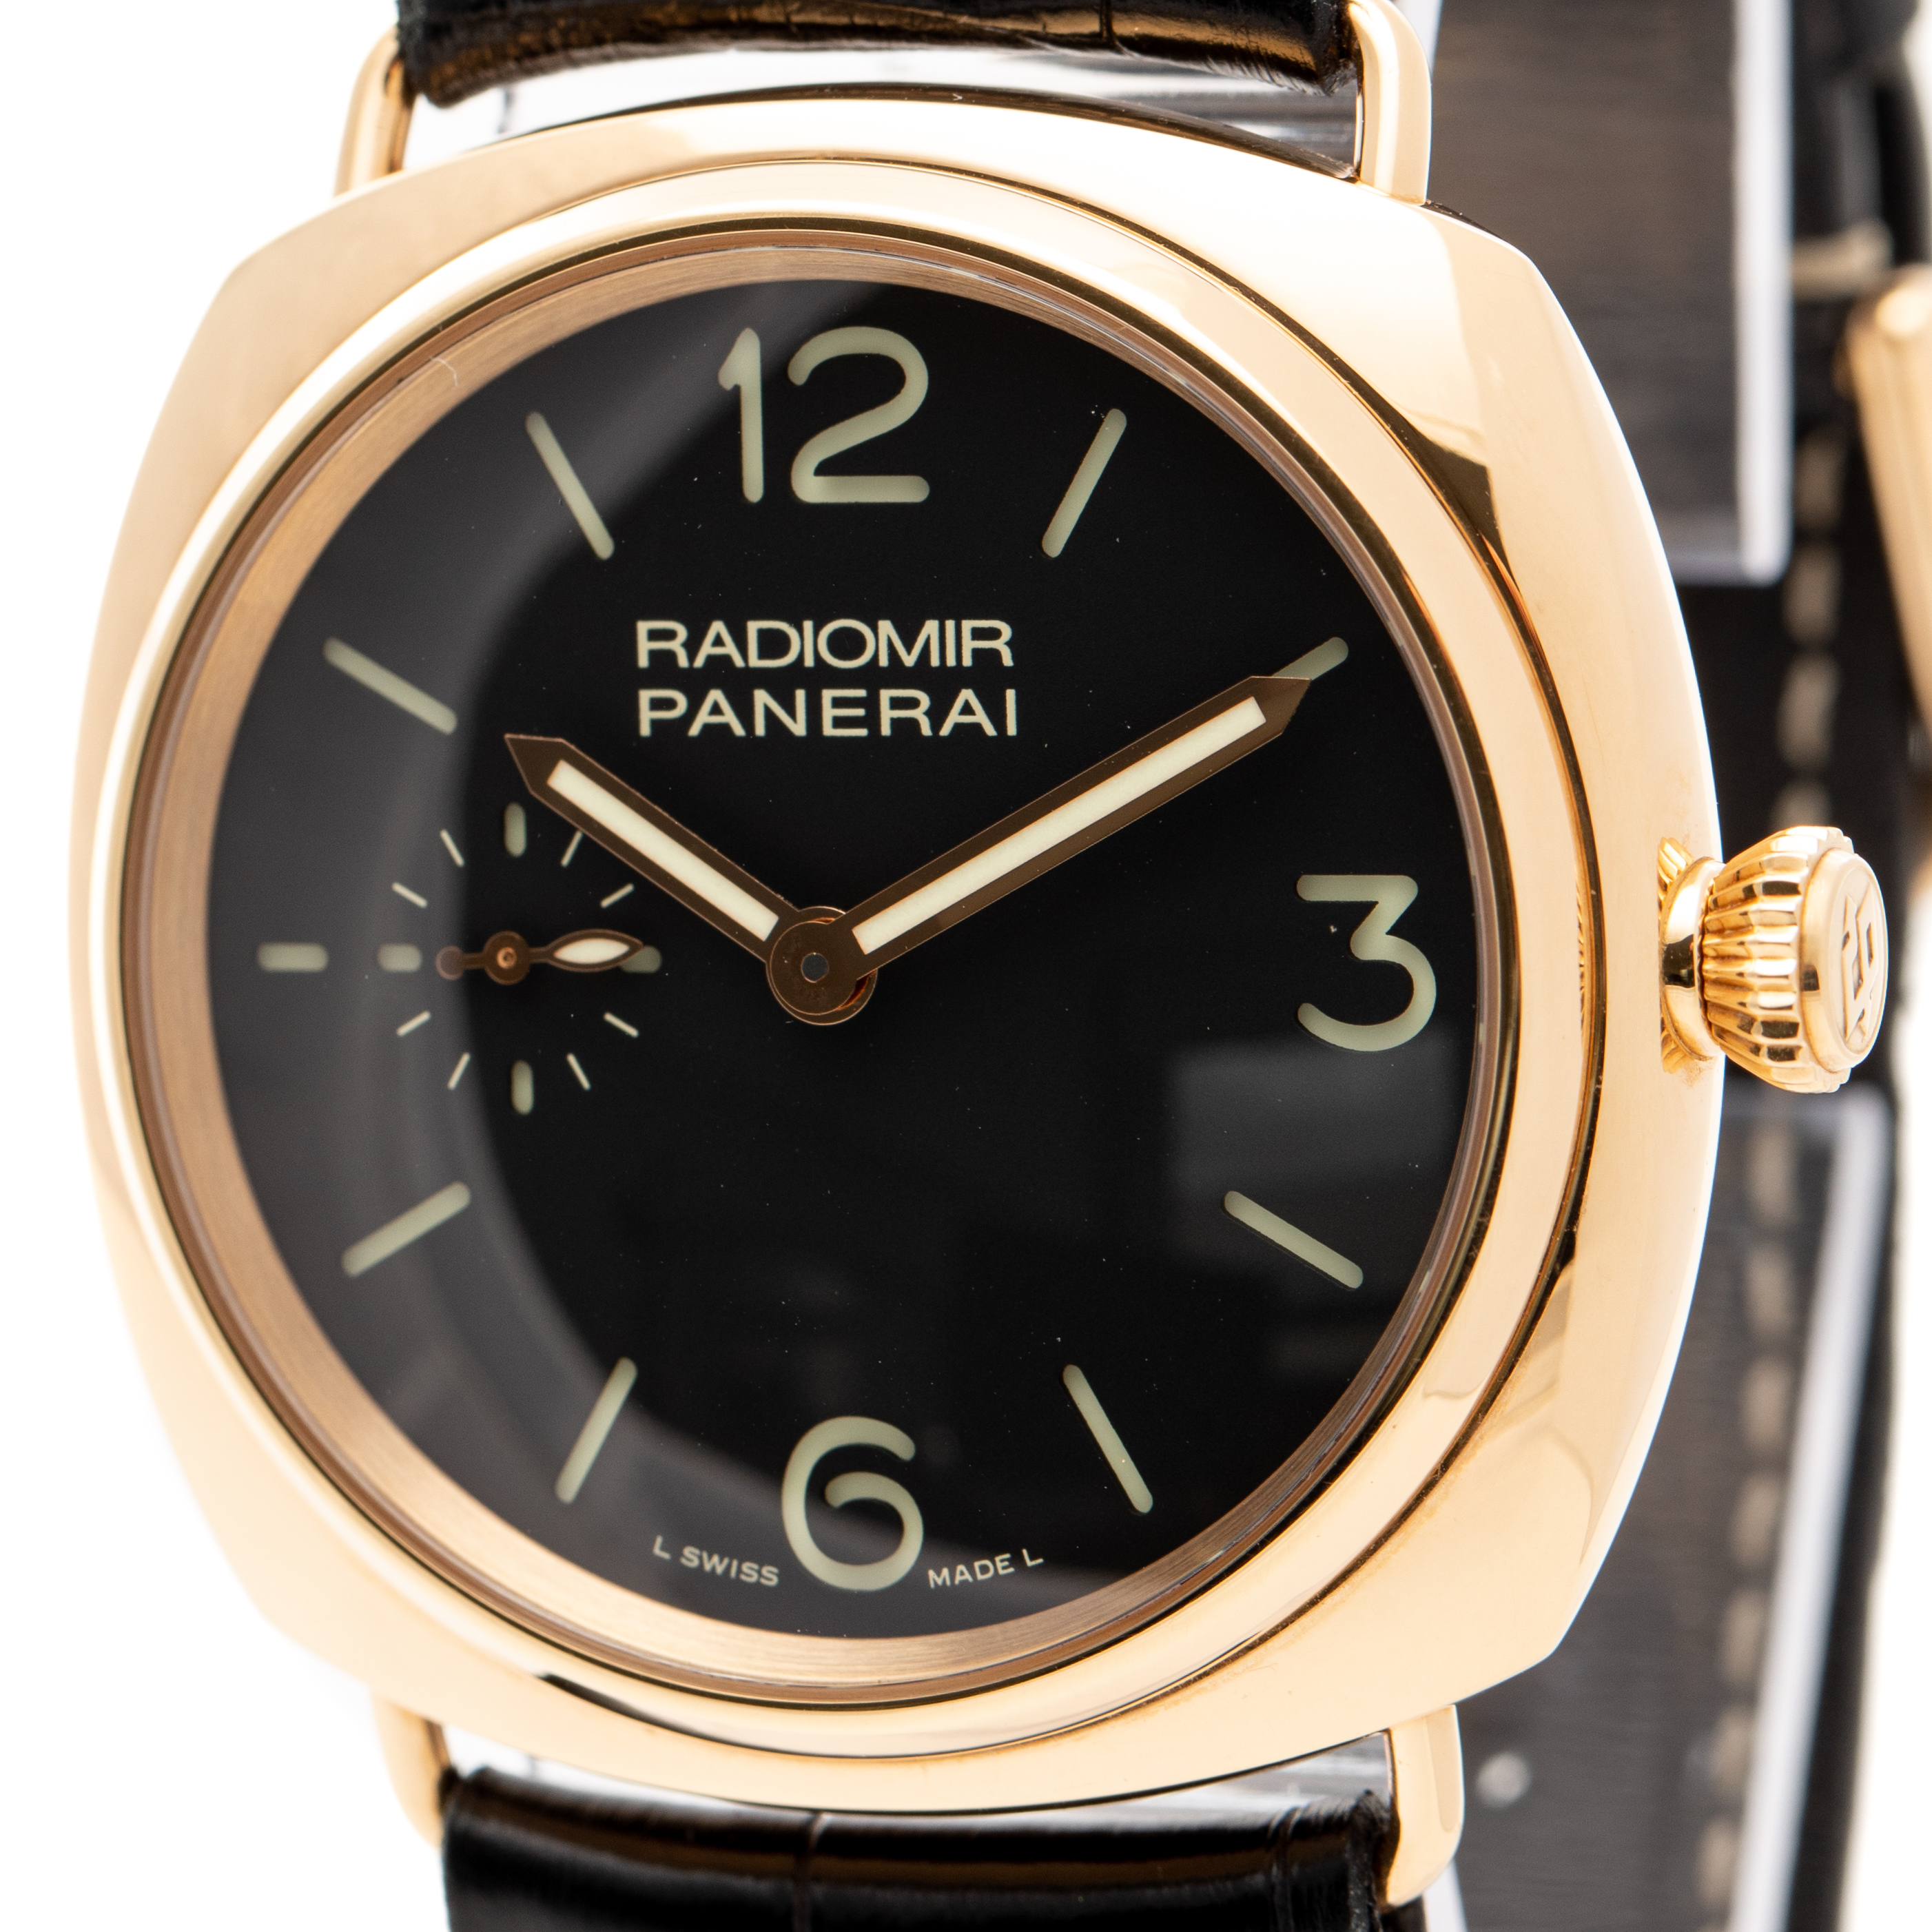 PANERAI RADIOMIR FIRENZE 1860 18K ROSE GOLD MANUAL WINDING 42MM REF: PAM00336